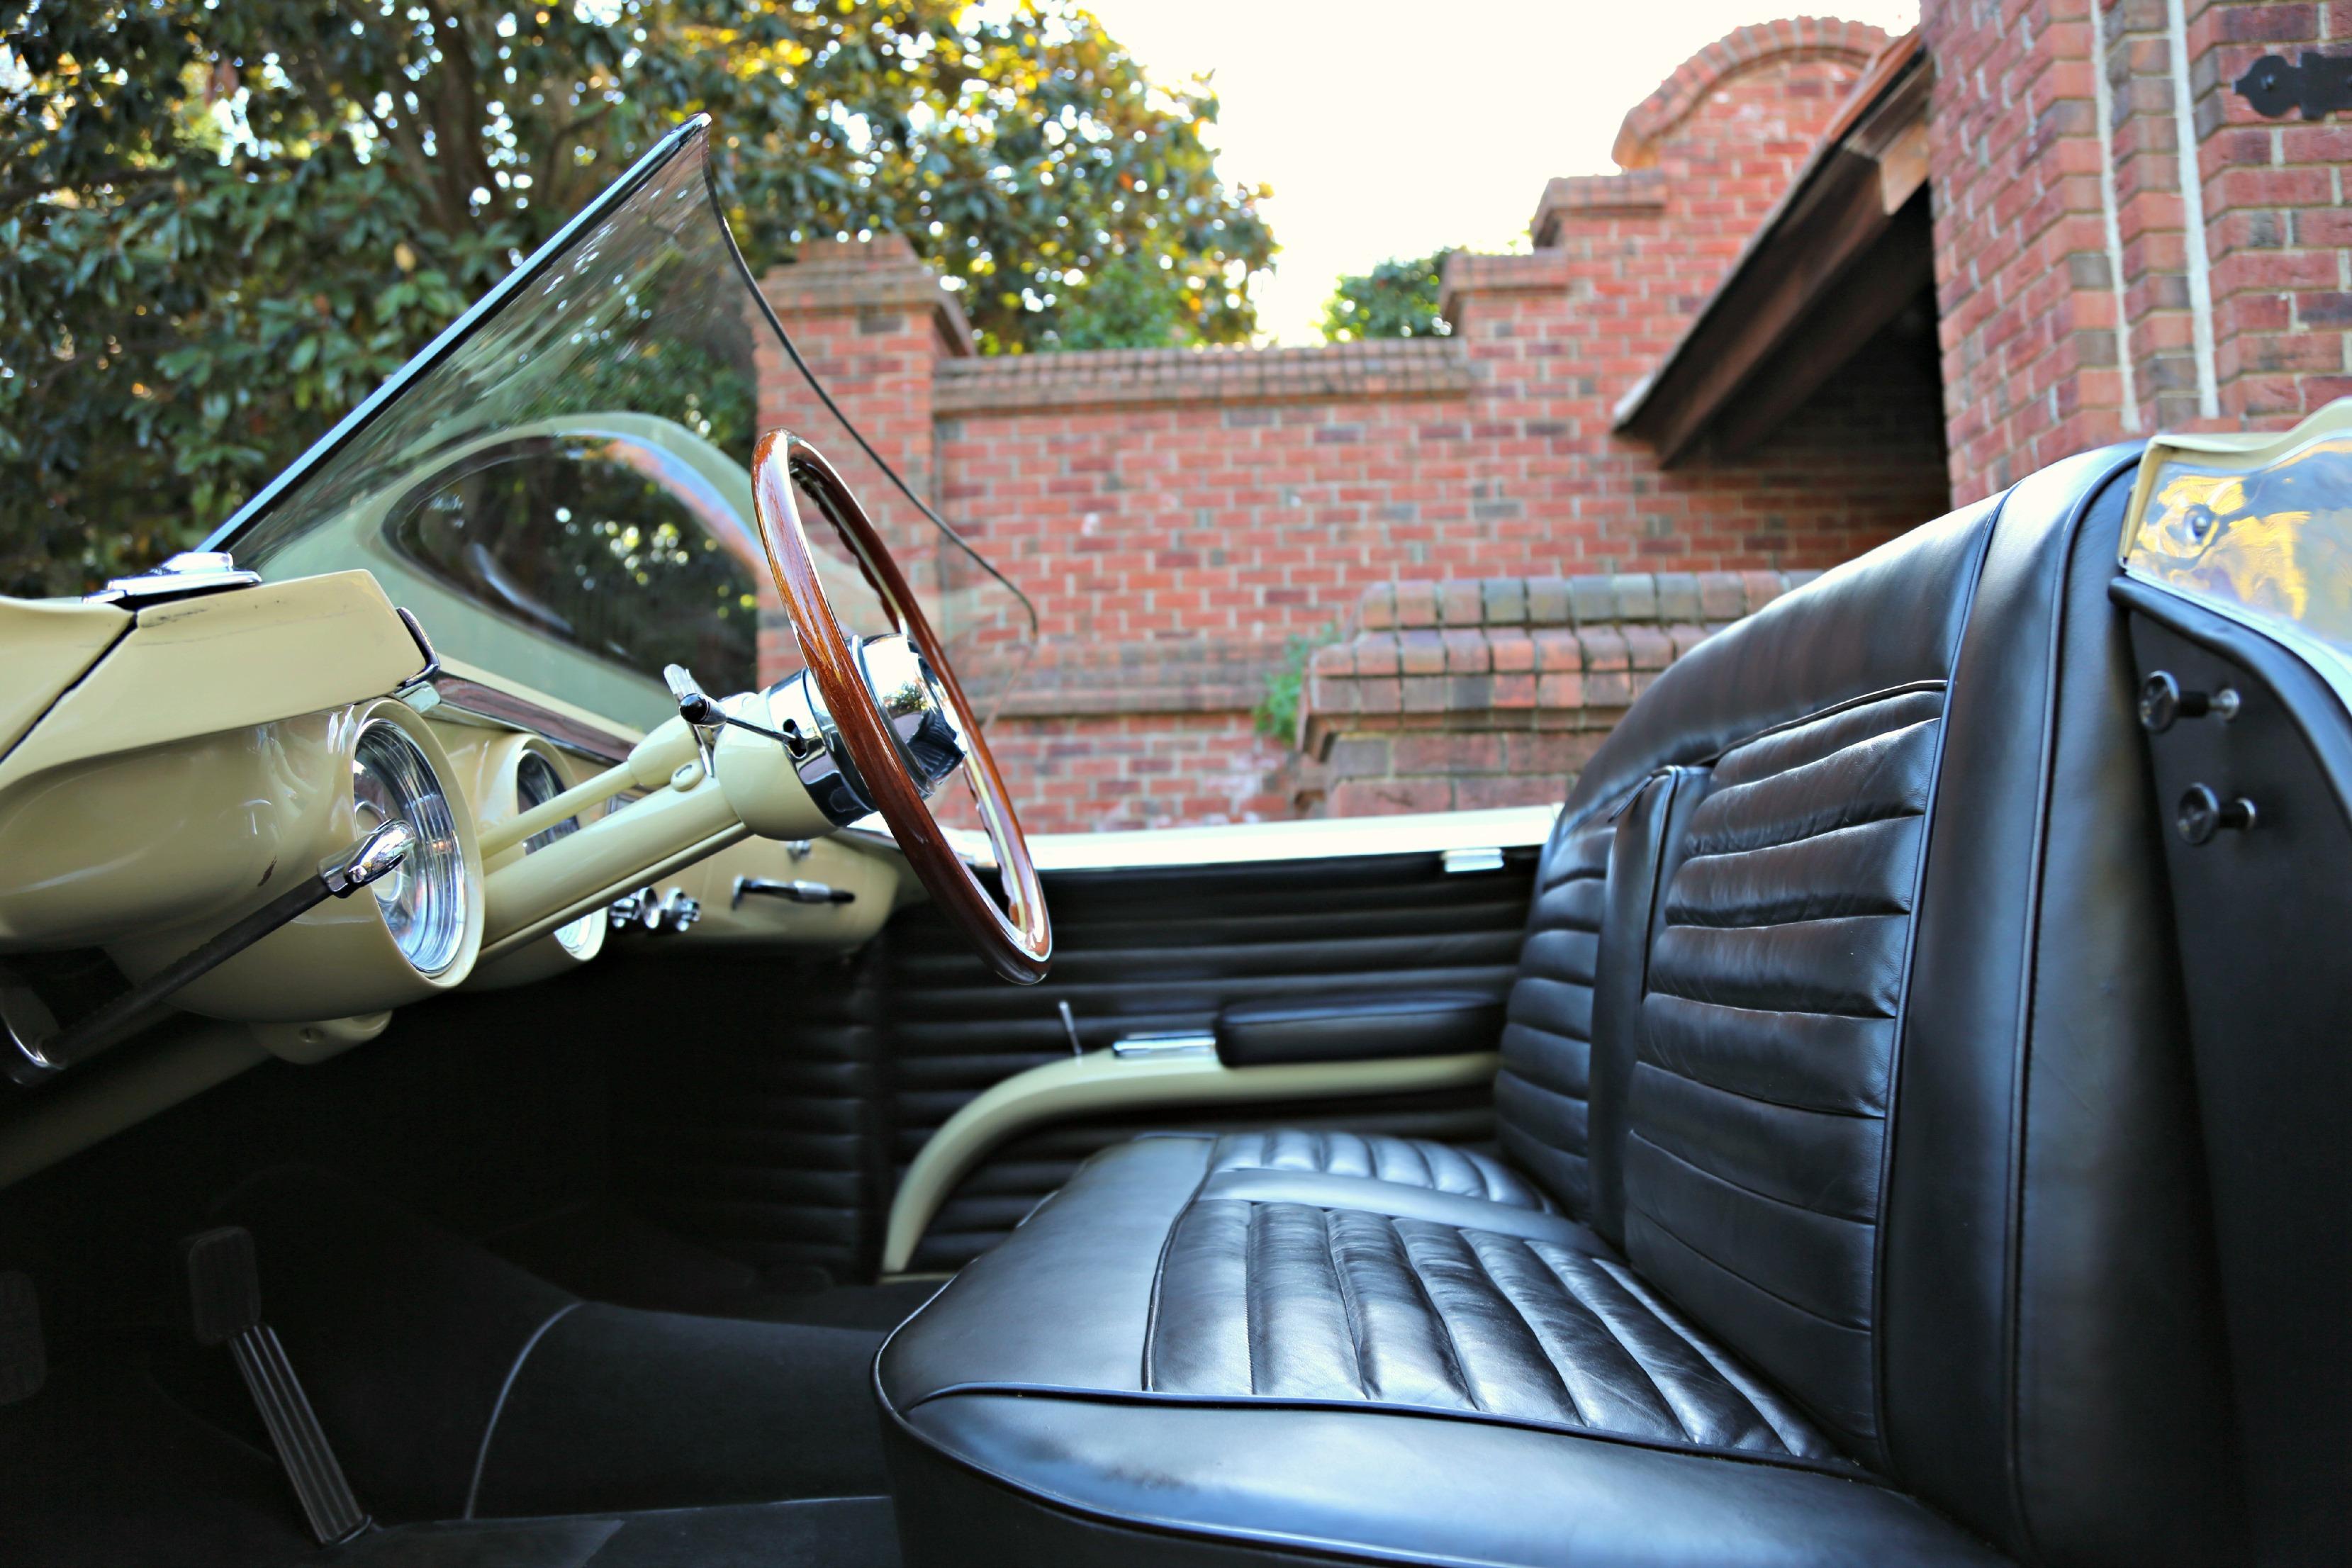 1954-Dodge-Fire-Arrow-II-One-Off-Concept-Car-16